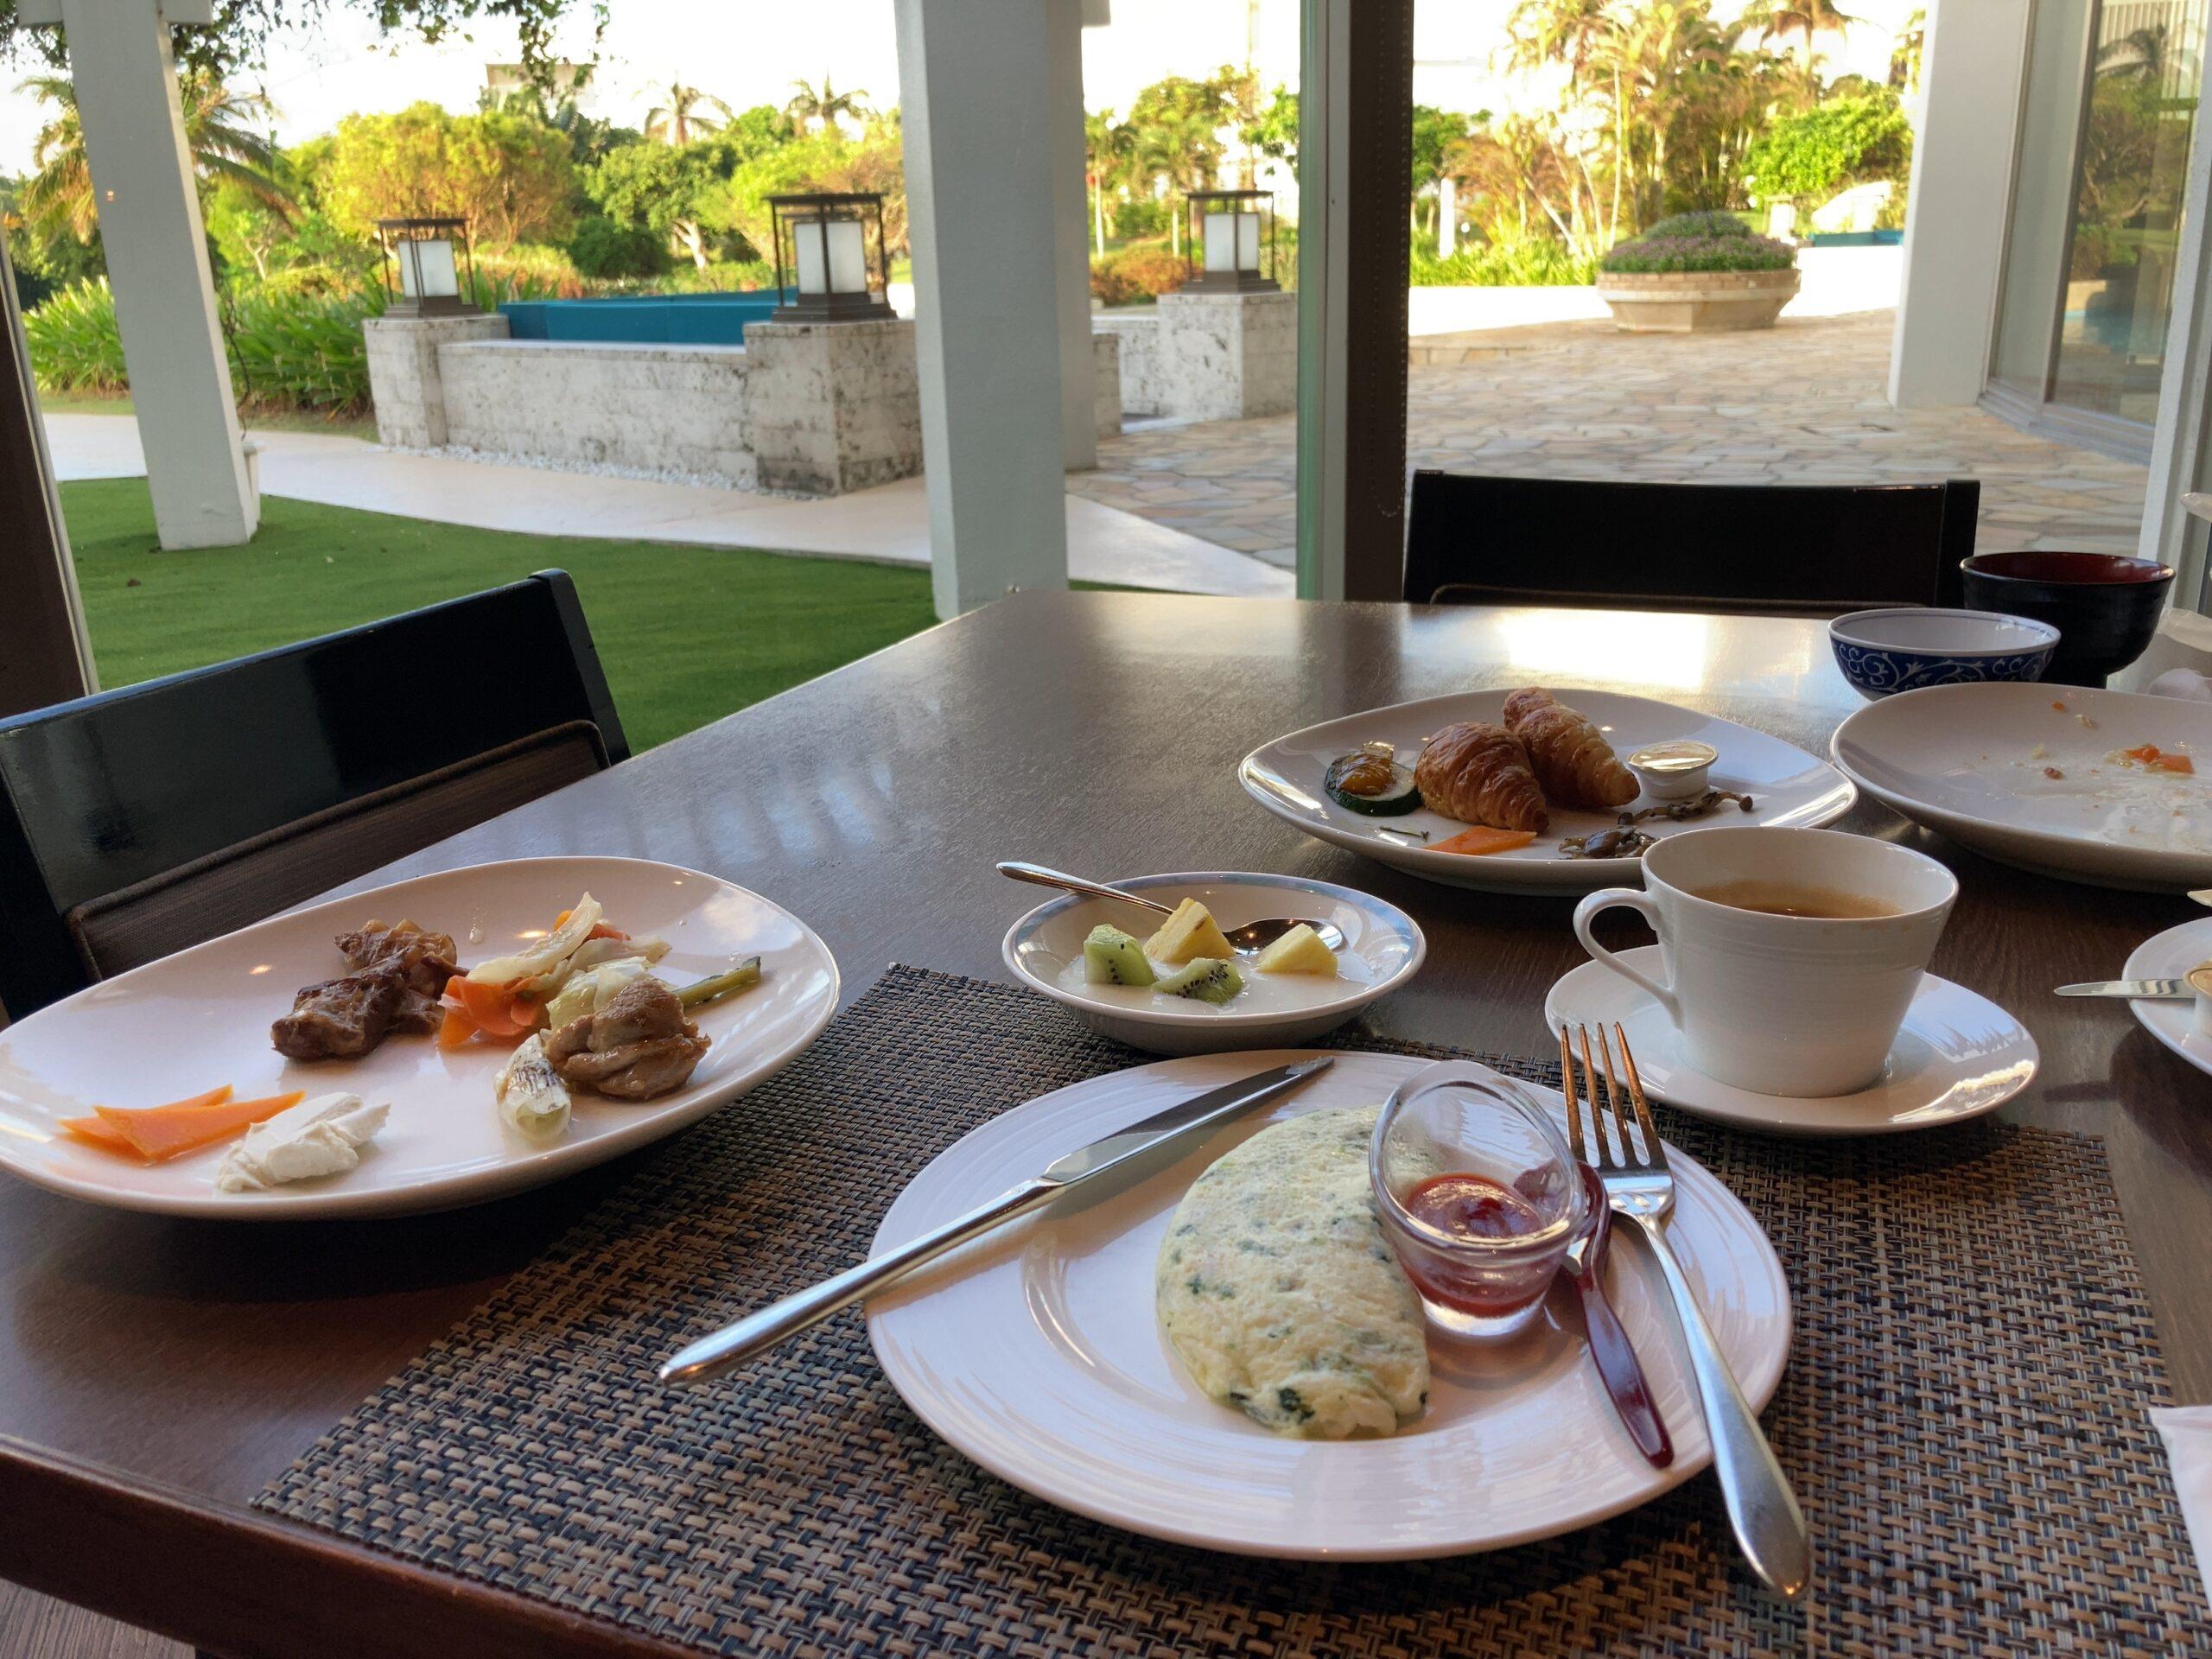 ANAインターコンチネンタル石垣リゾート朝食の様子